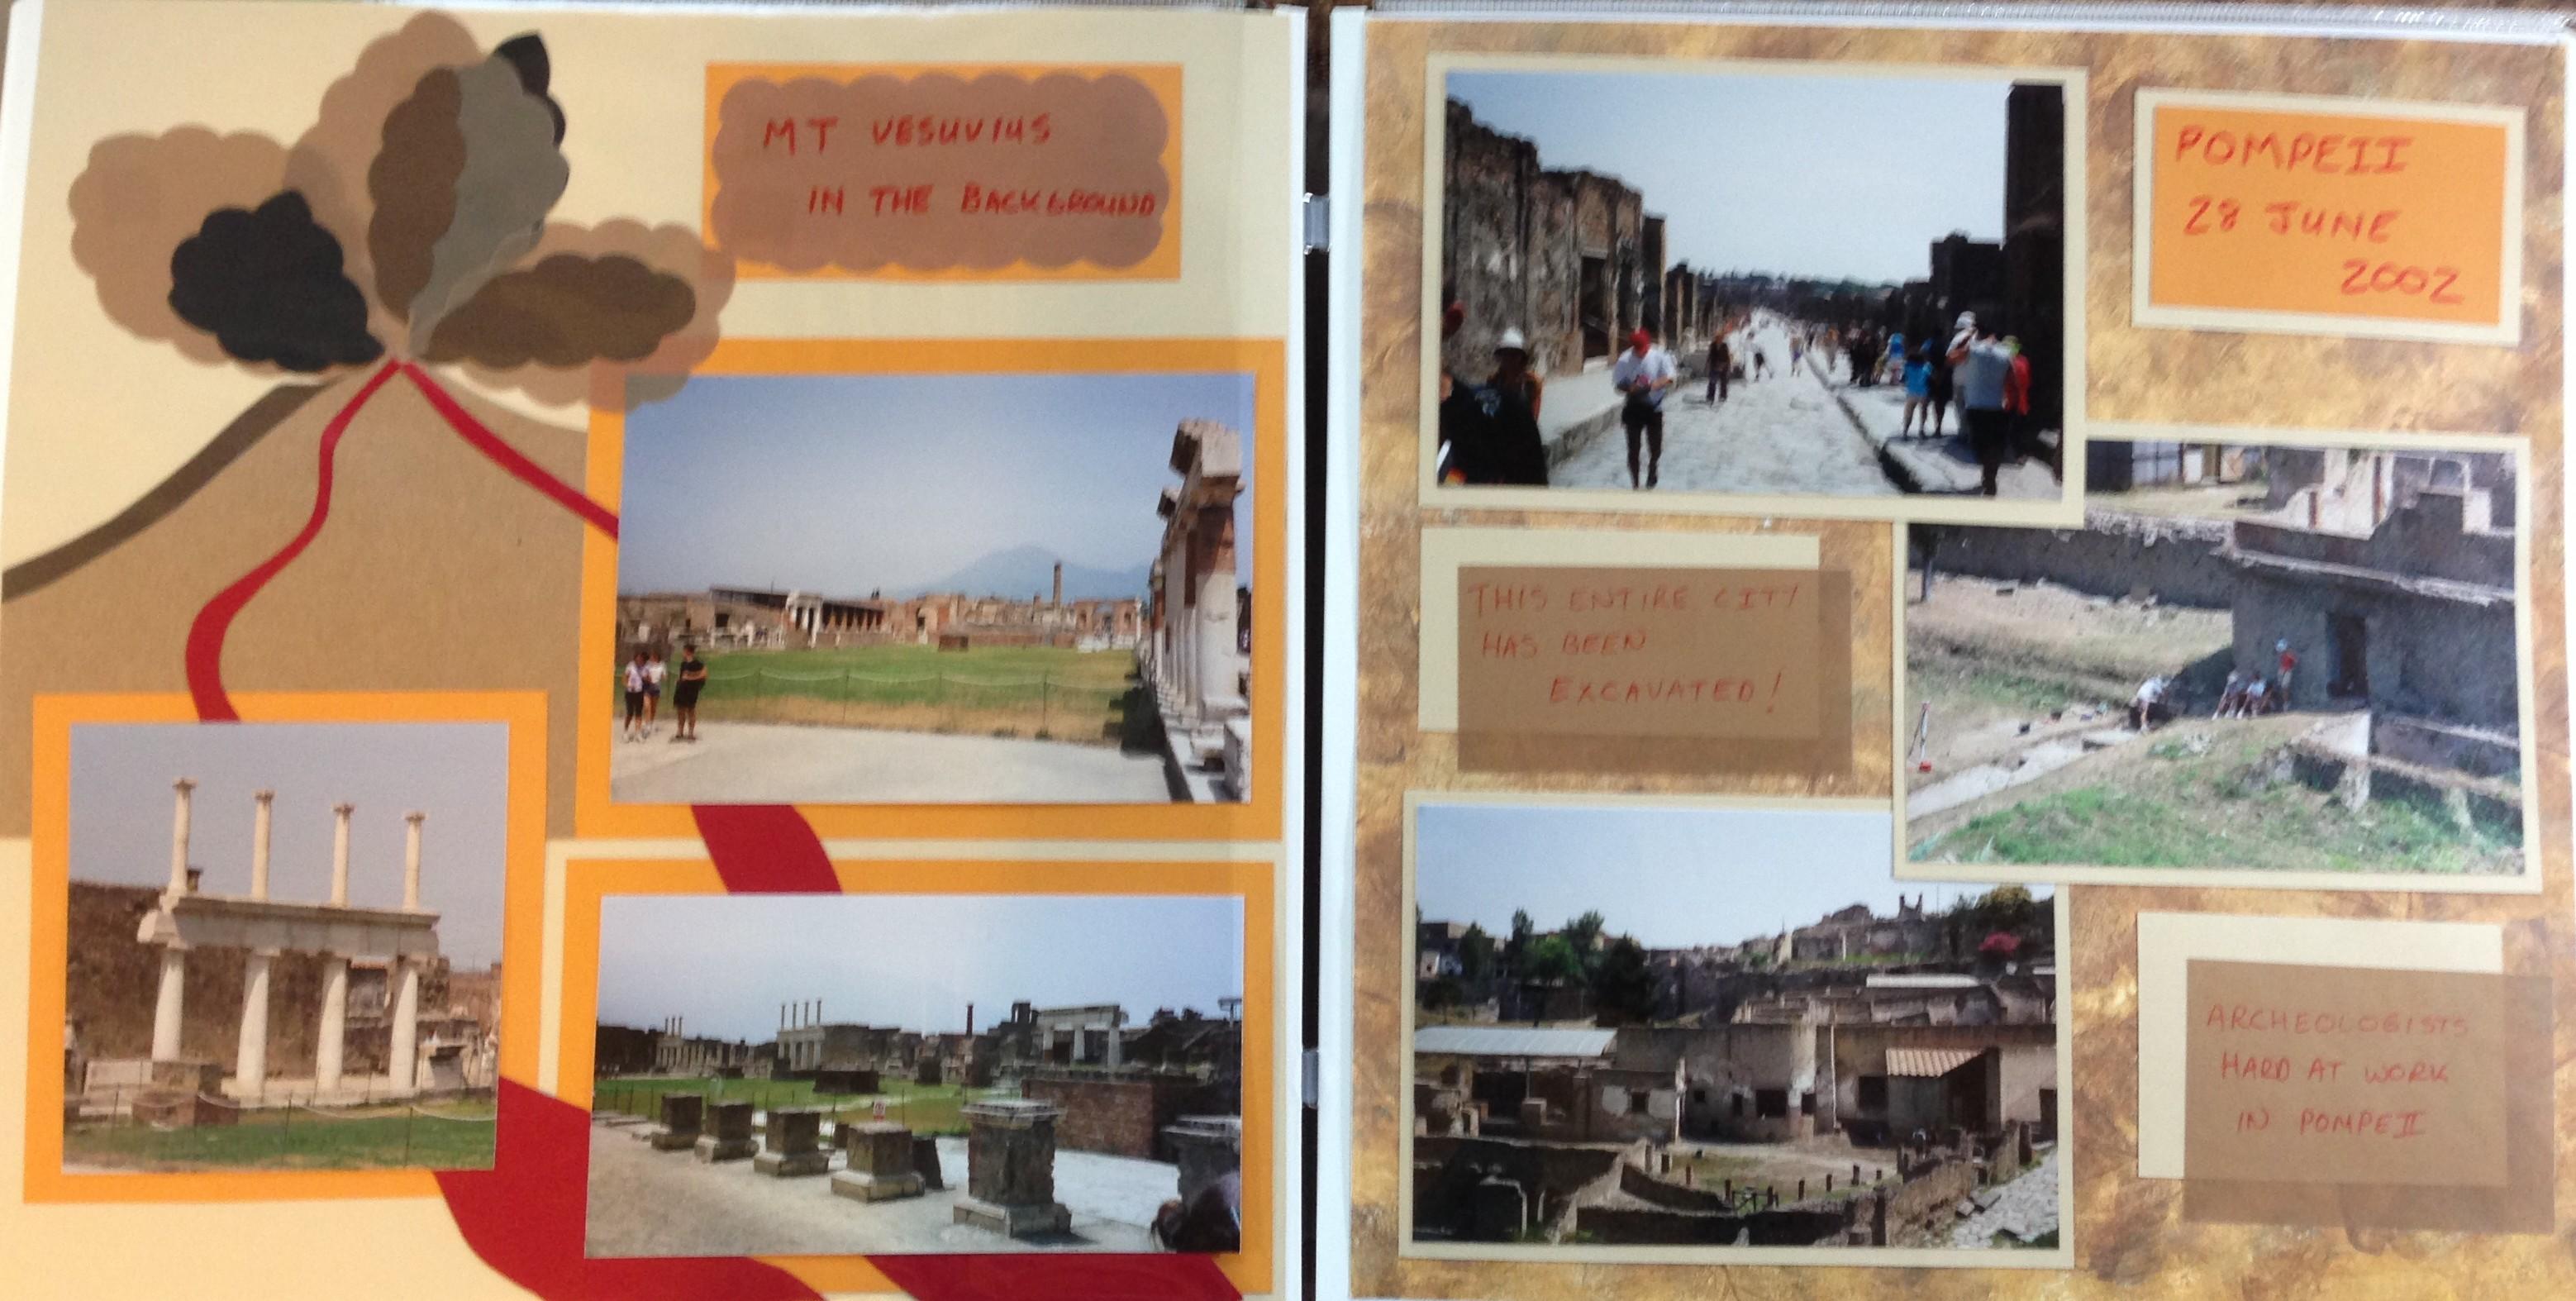 Europe scrapbook ideas - Europe Trip Pompeii Italy